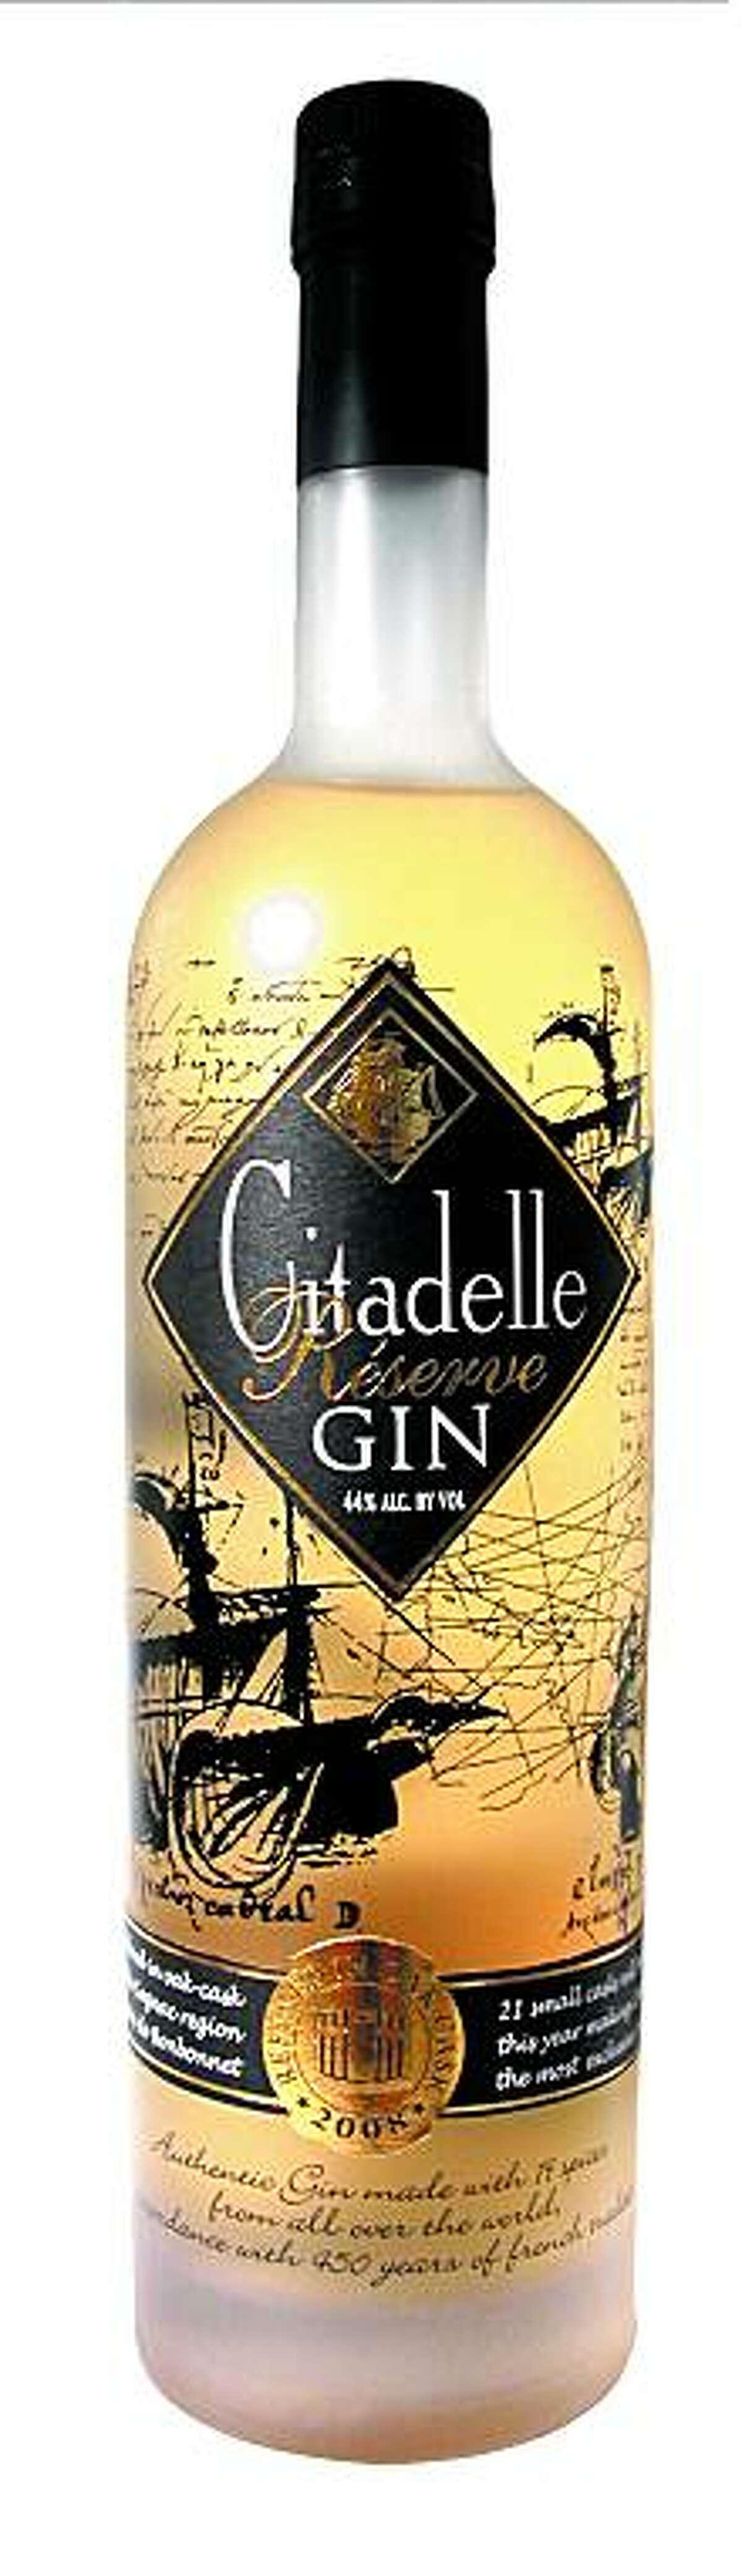 Citadelle Reserve Gin.Courtesy Cognac Ferrand USA, Inc.